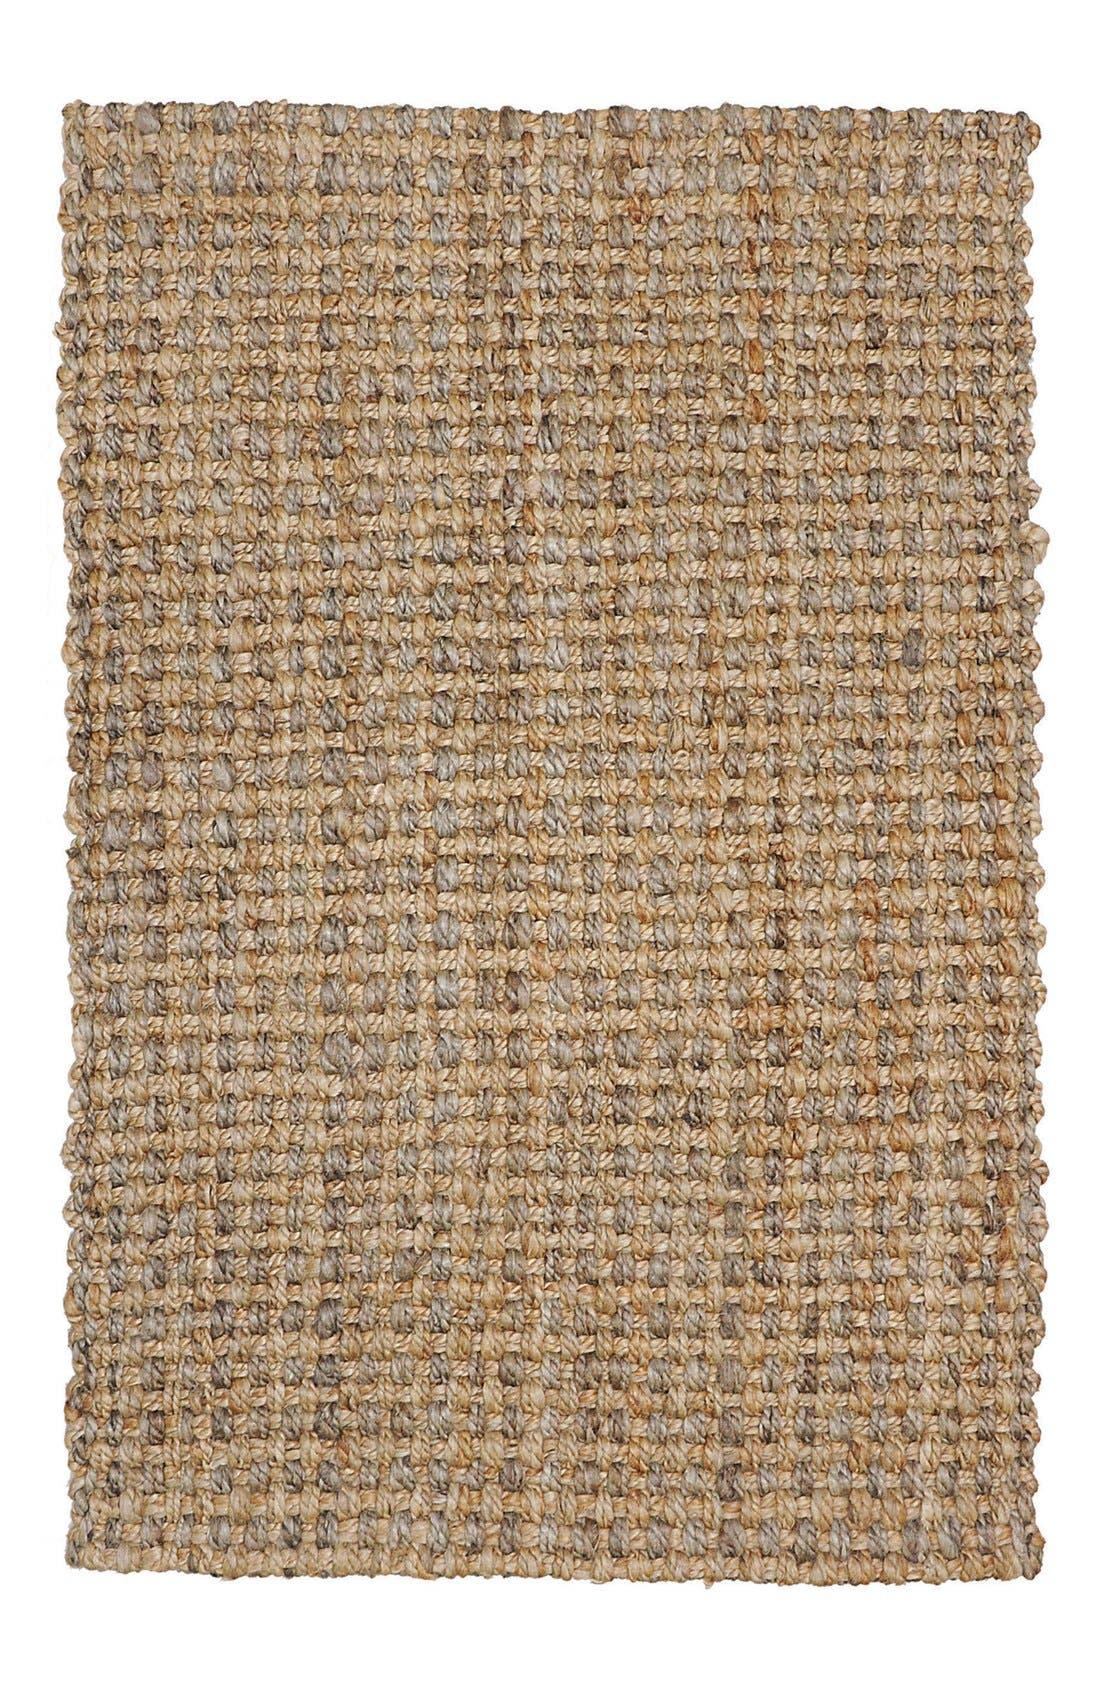 Panama Handwoven Rug,                         Main,                         color, Natural/ Grey